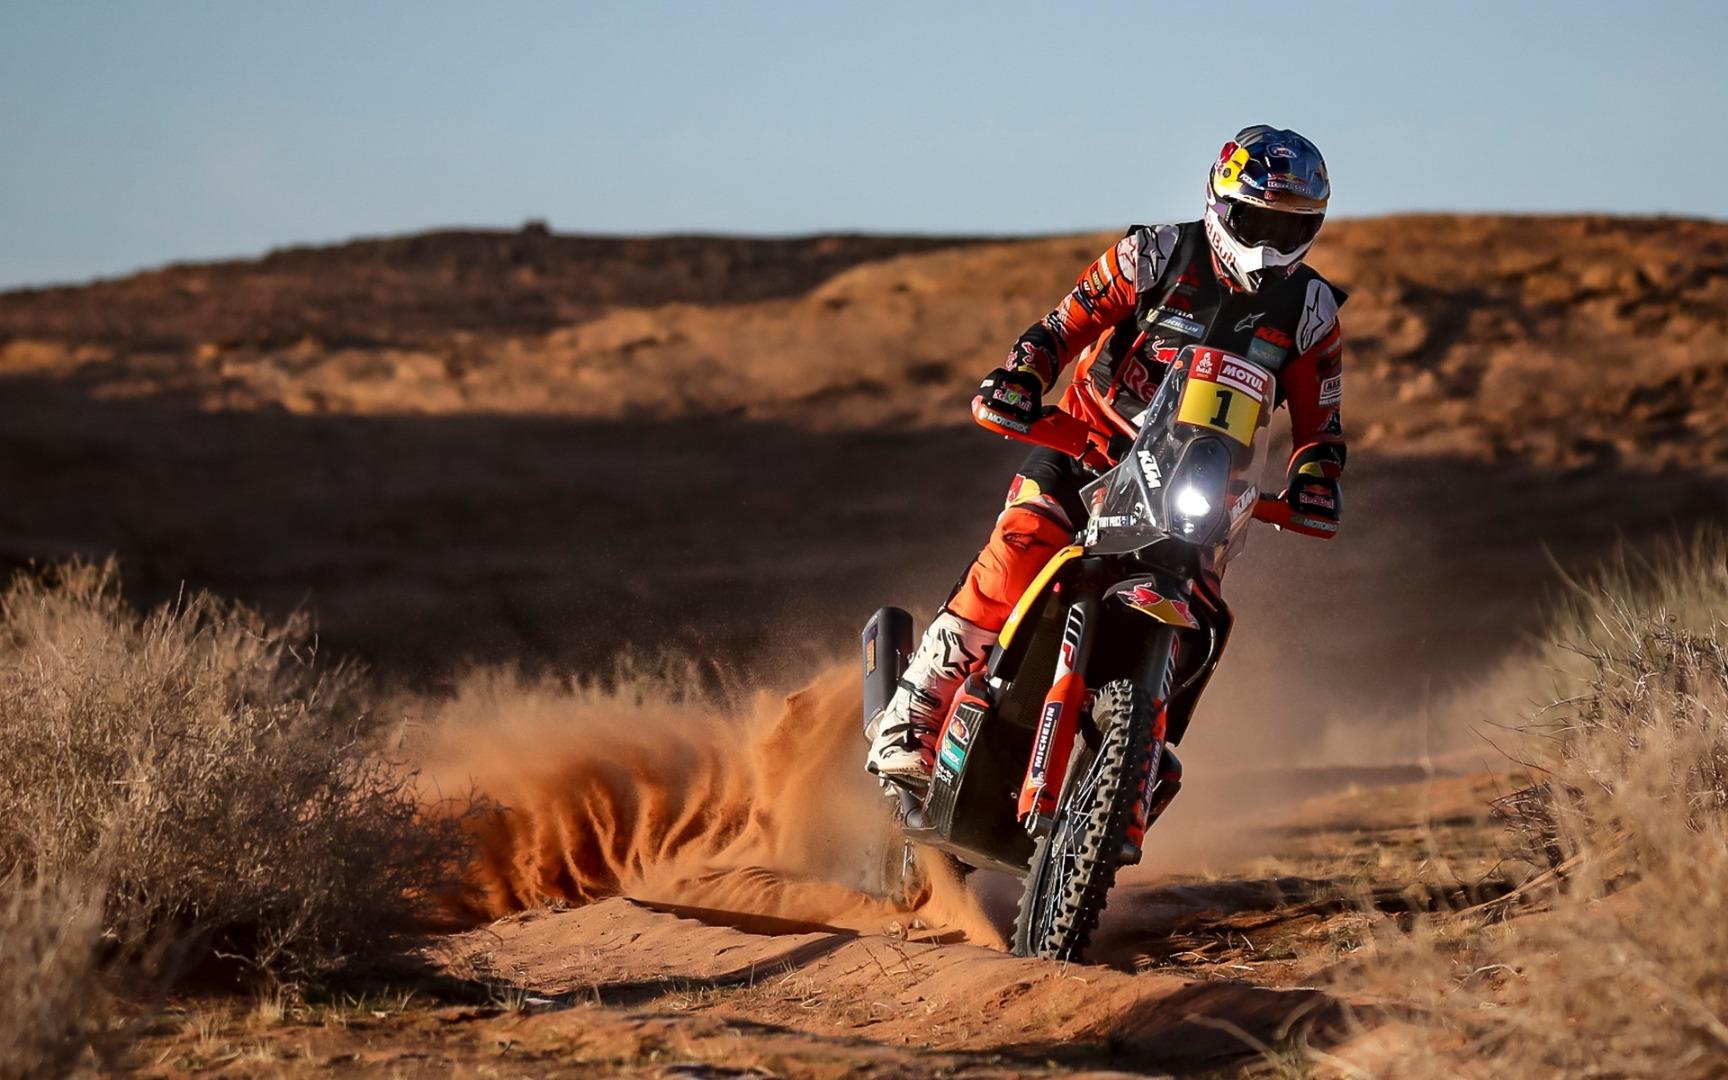 Toby Price, KTM Factory Racing, Etapa 5, Dakar 2020